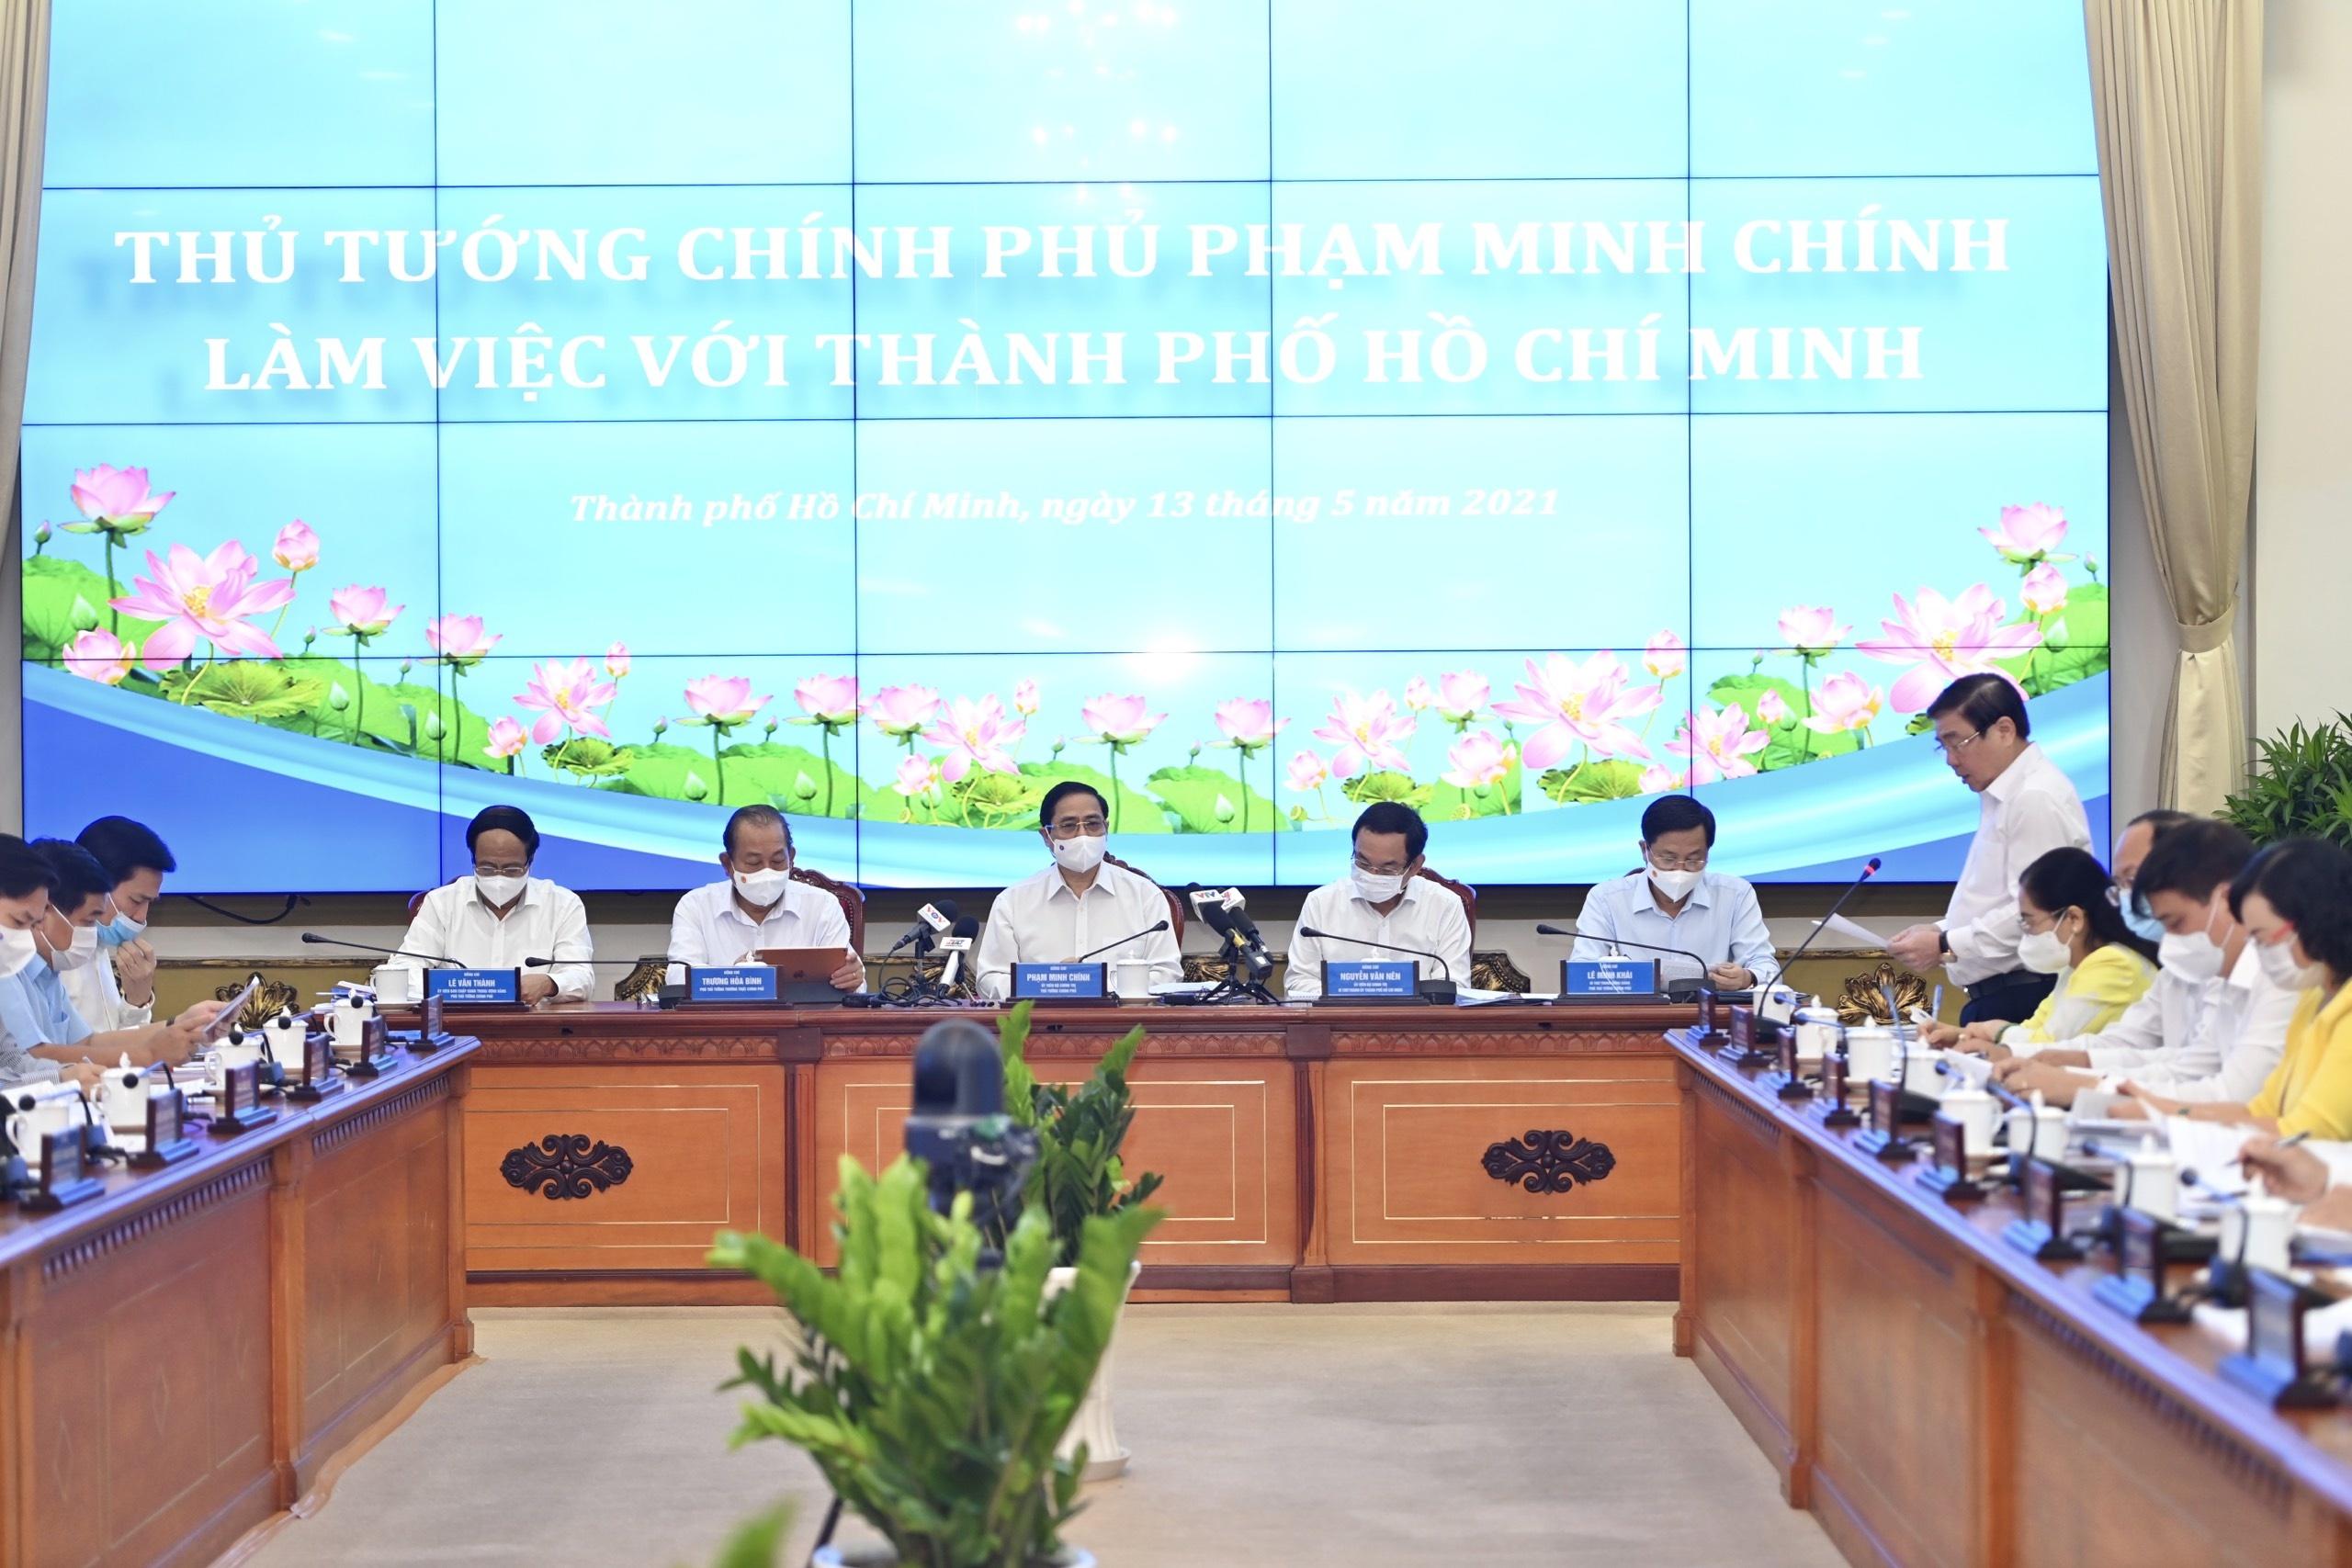 Thu tuong Pham Minh Chinh lam viec voi TP.HCM anh 3